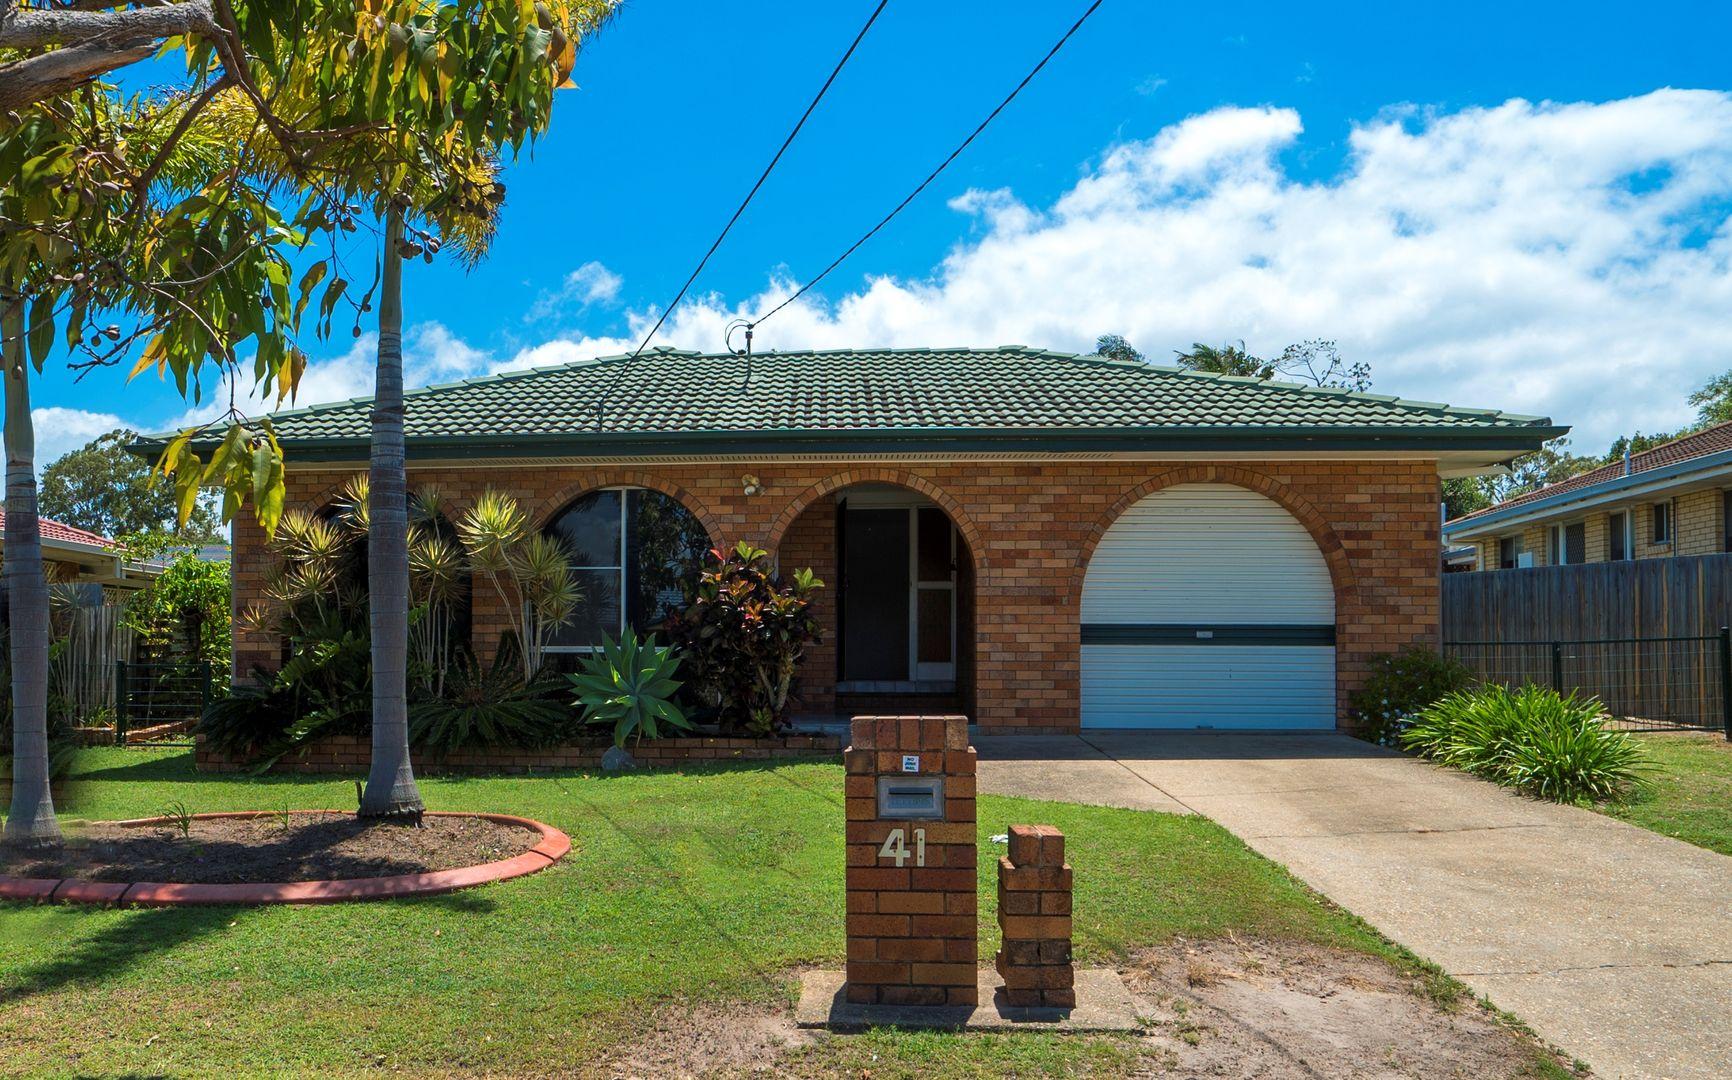 41 Susan Avenue, Kippa-Ring QLD 4021, Image 0